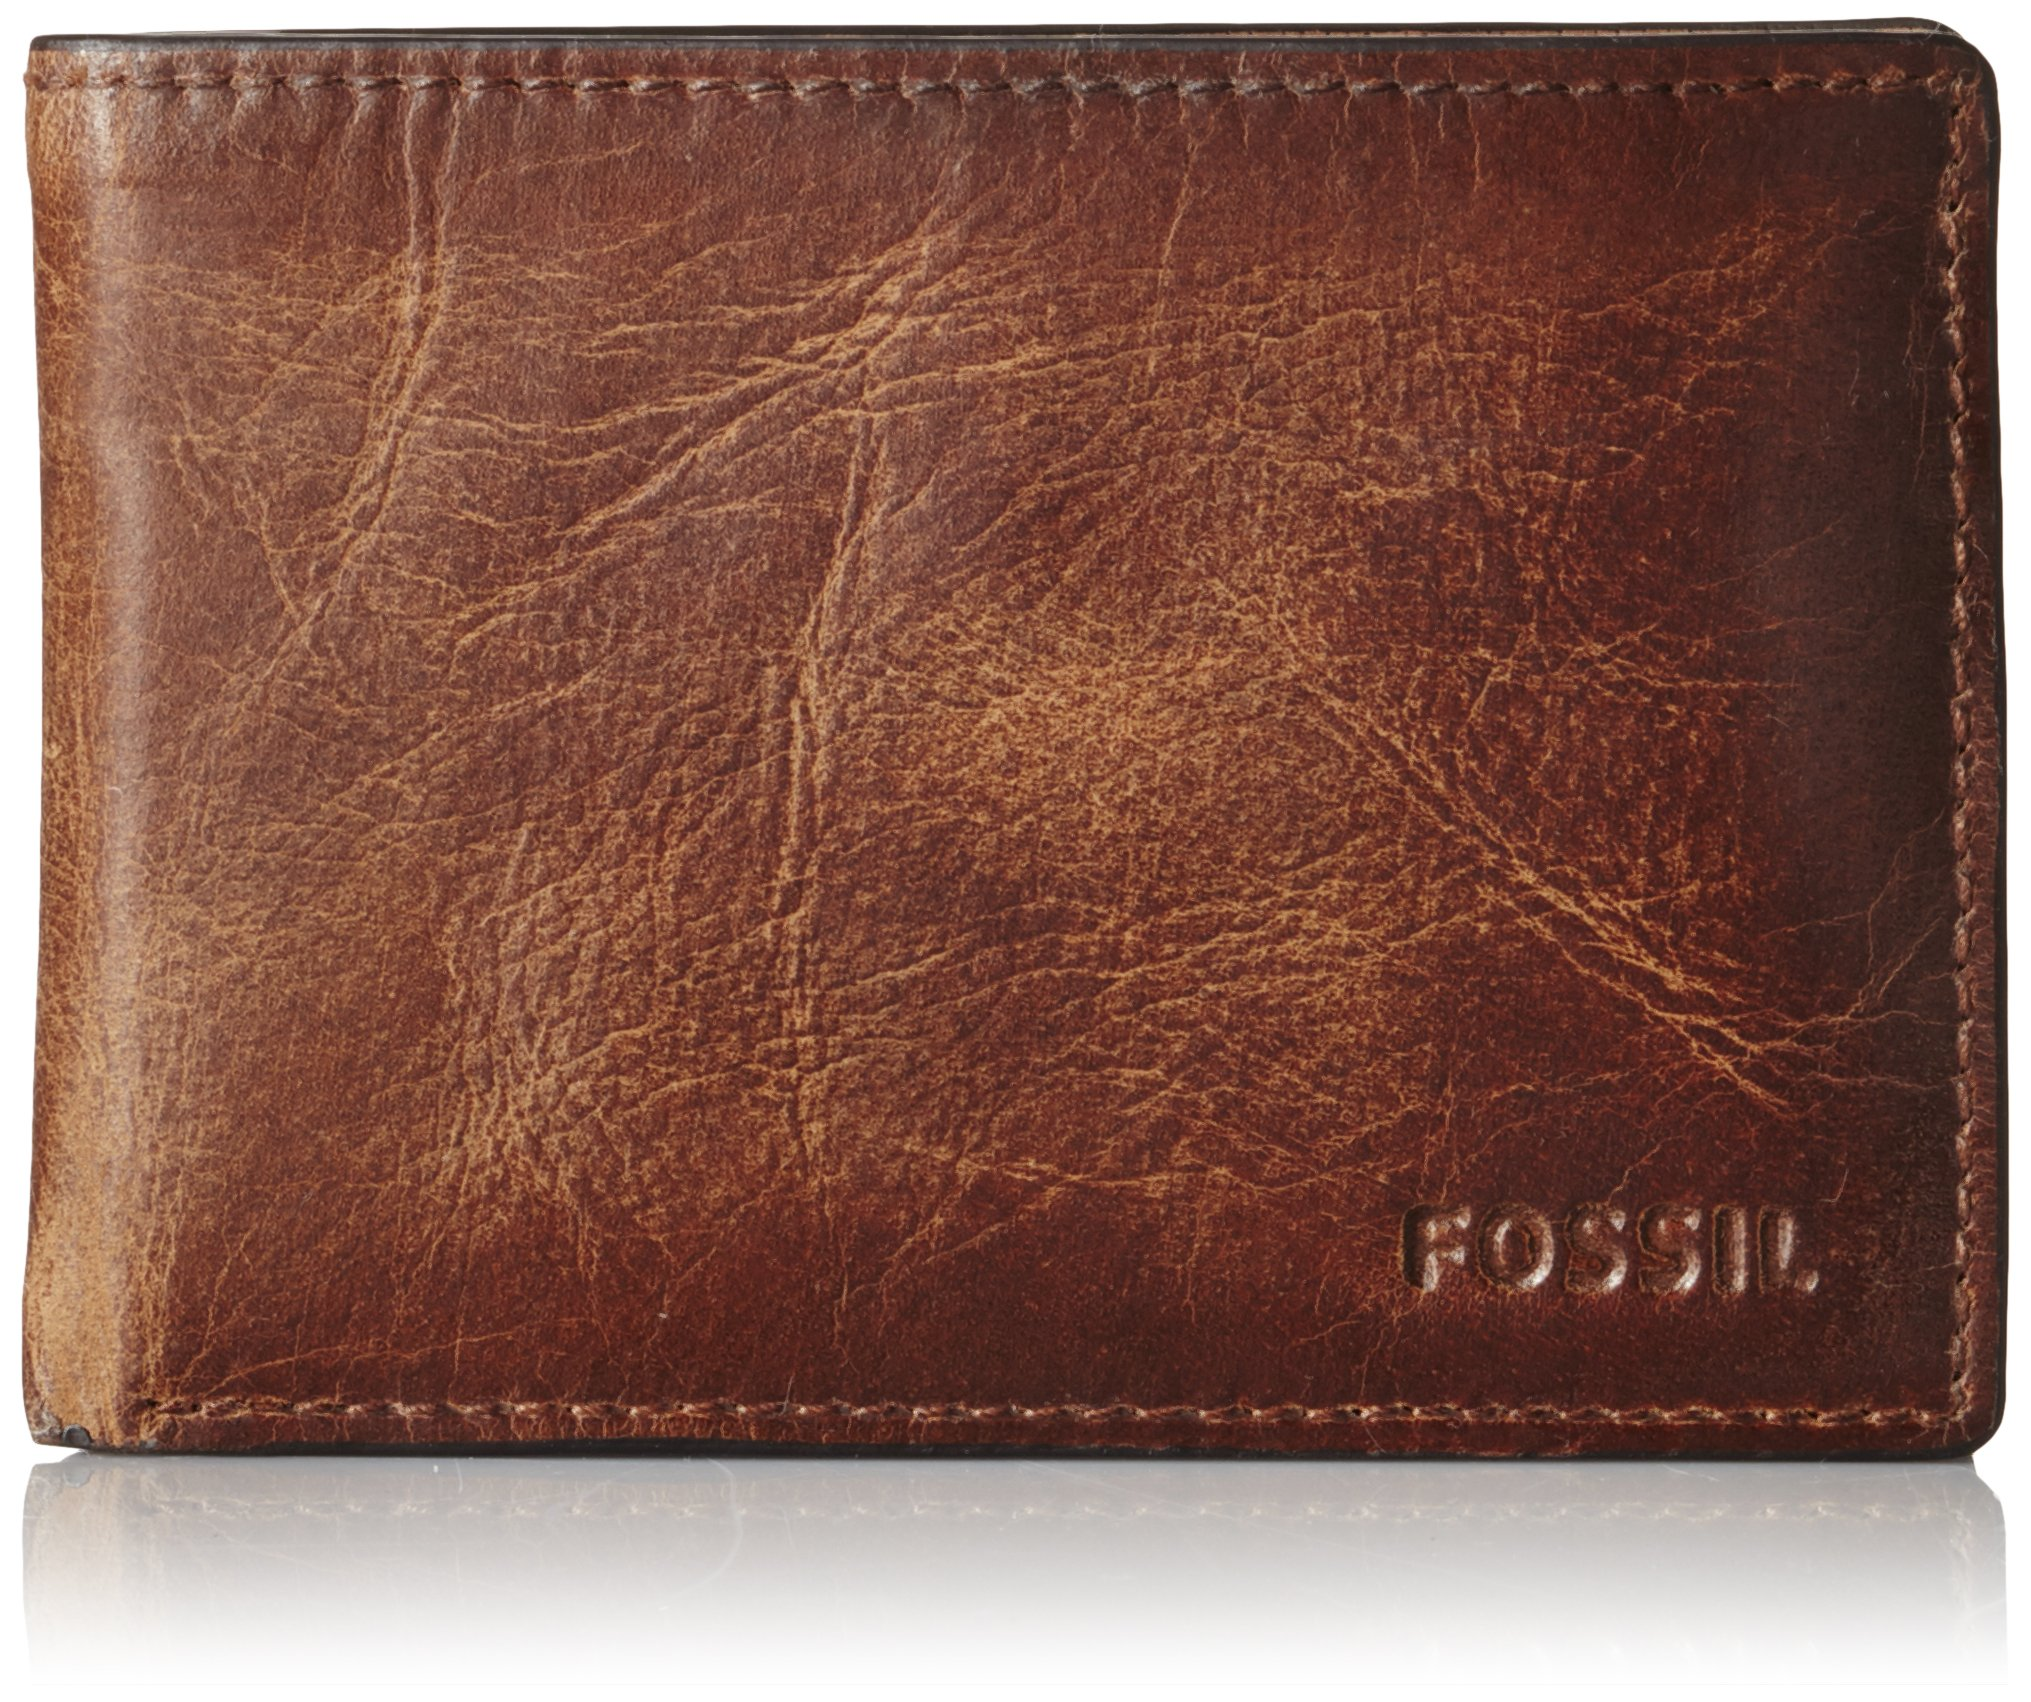 Fossil Mens Bifold Wallet Derrick Brown